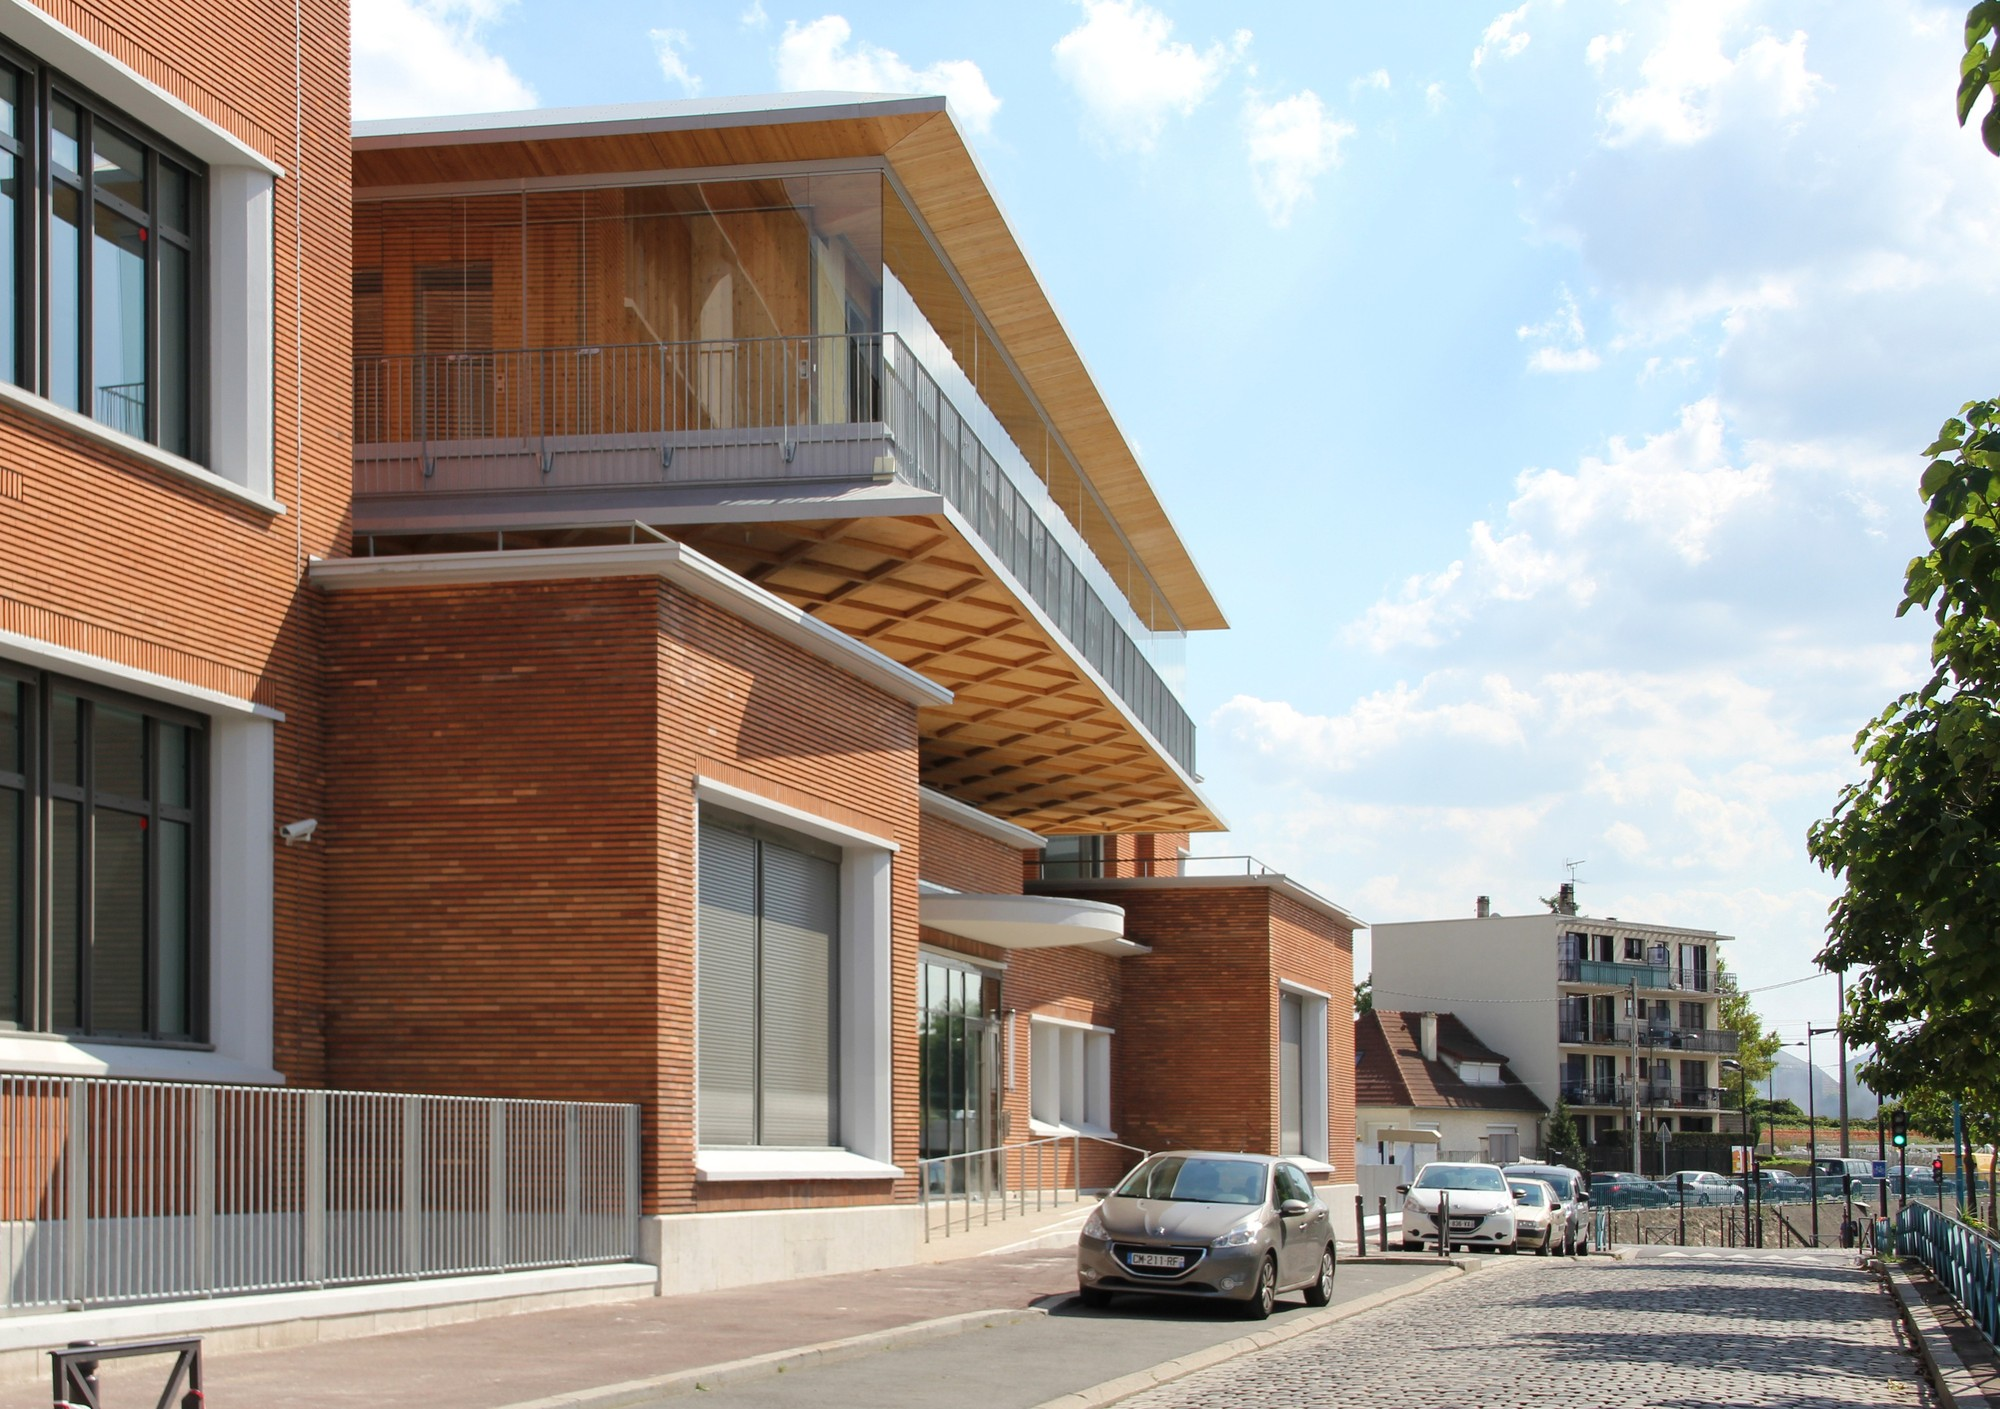 Secondary School / Hubert & Roy Architectes, Courtesy of Hubert & Roy Architectes